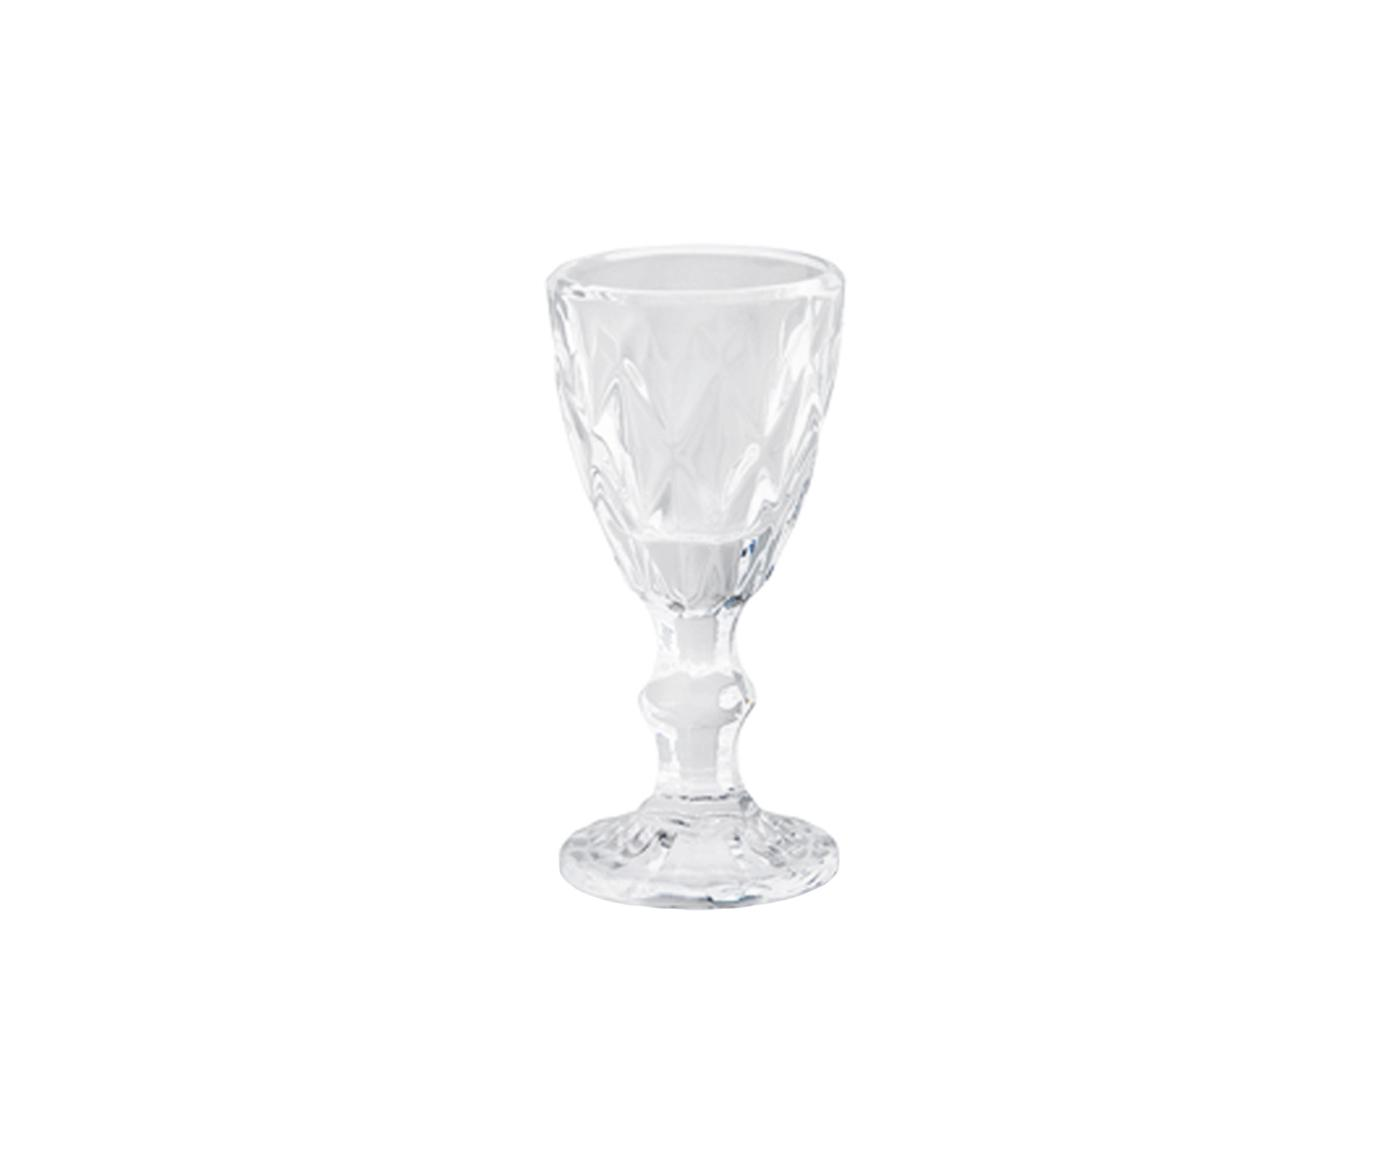 Schnapsgläser Prisma mit Kristallrelief, 6 Stück, Glas, Transparent, Ø 5 x H 11 cm